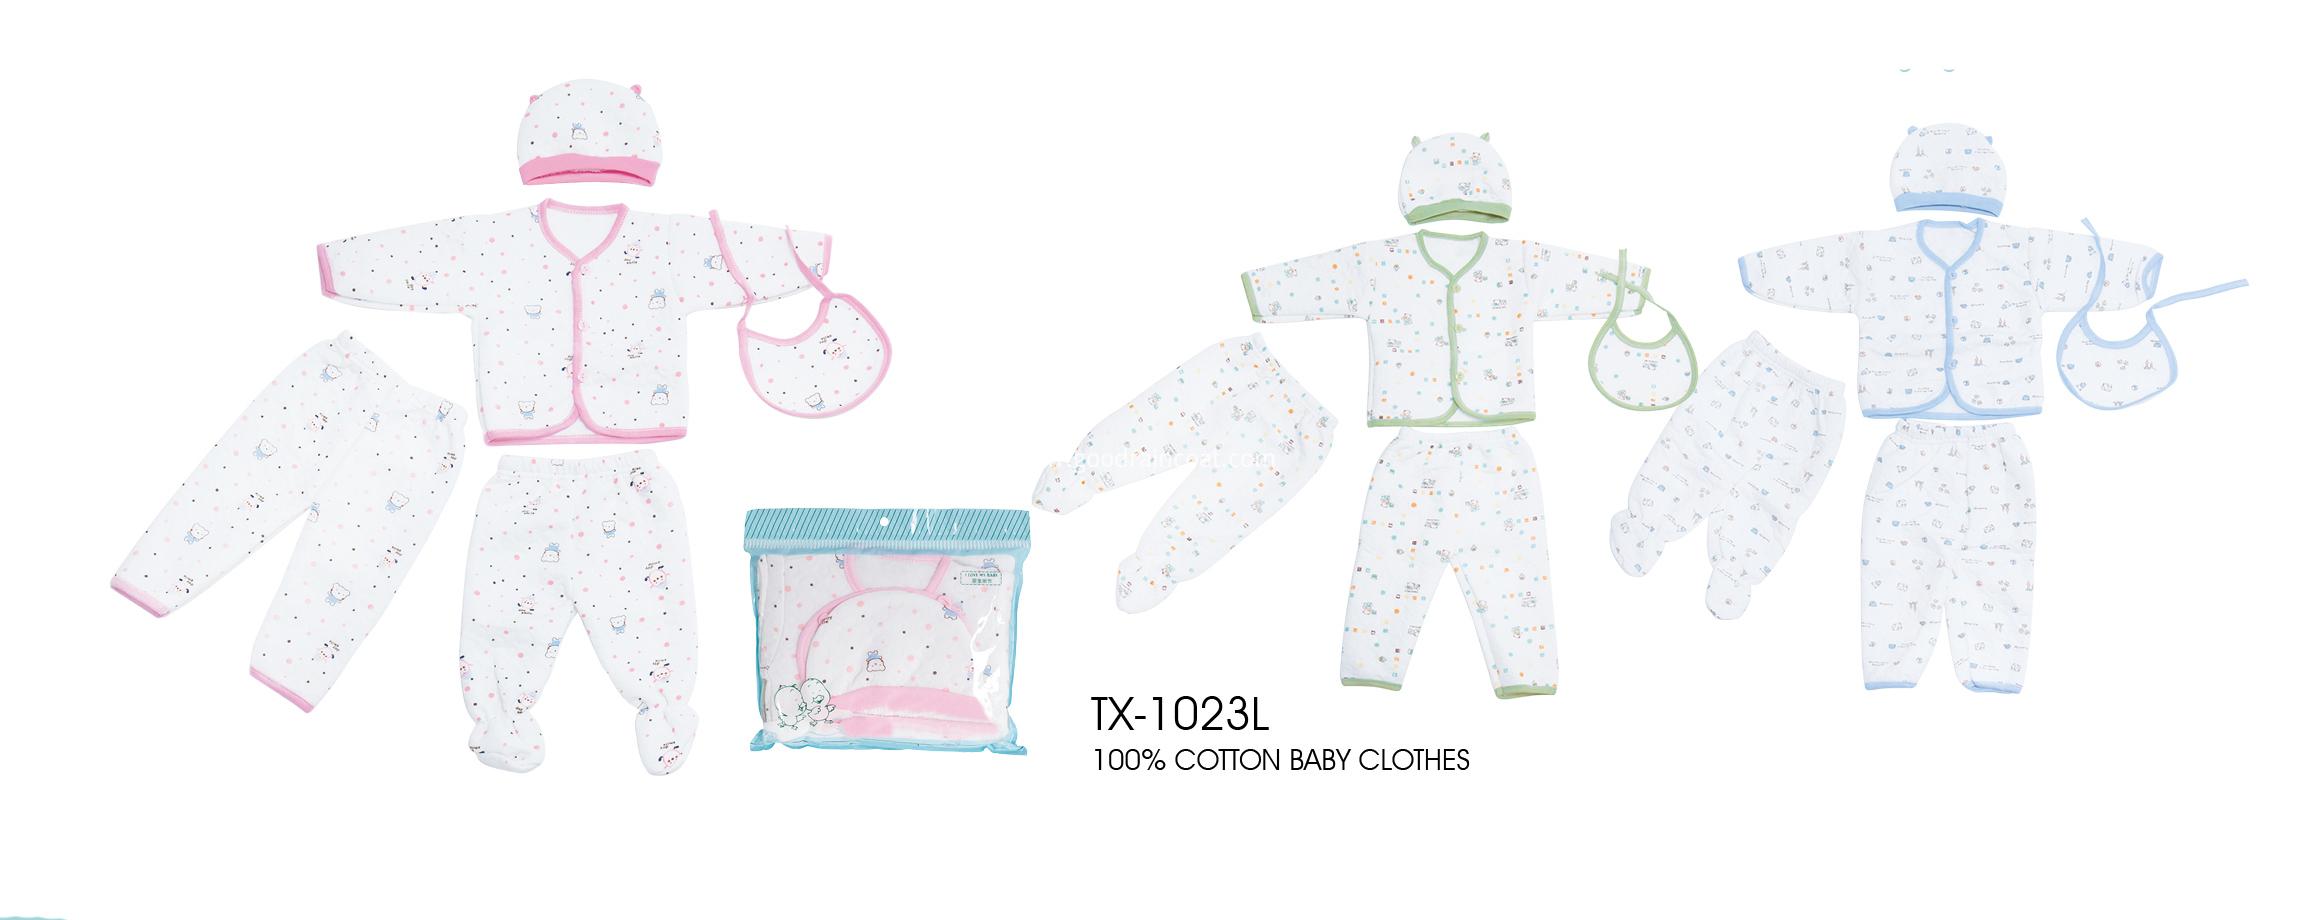 5 pcs baby clothes set